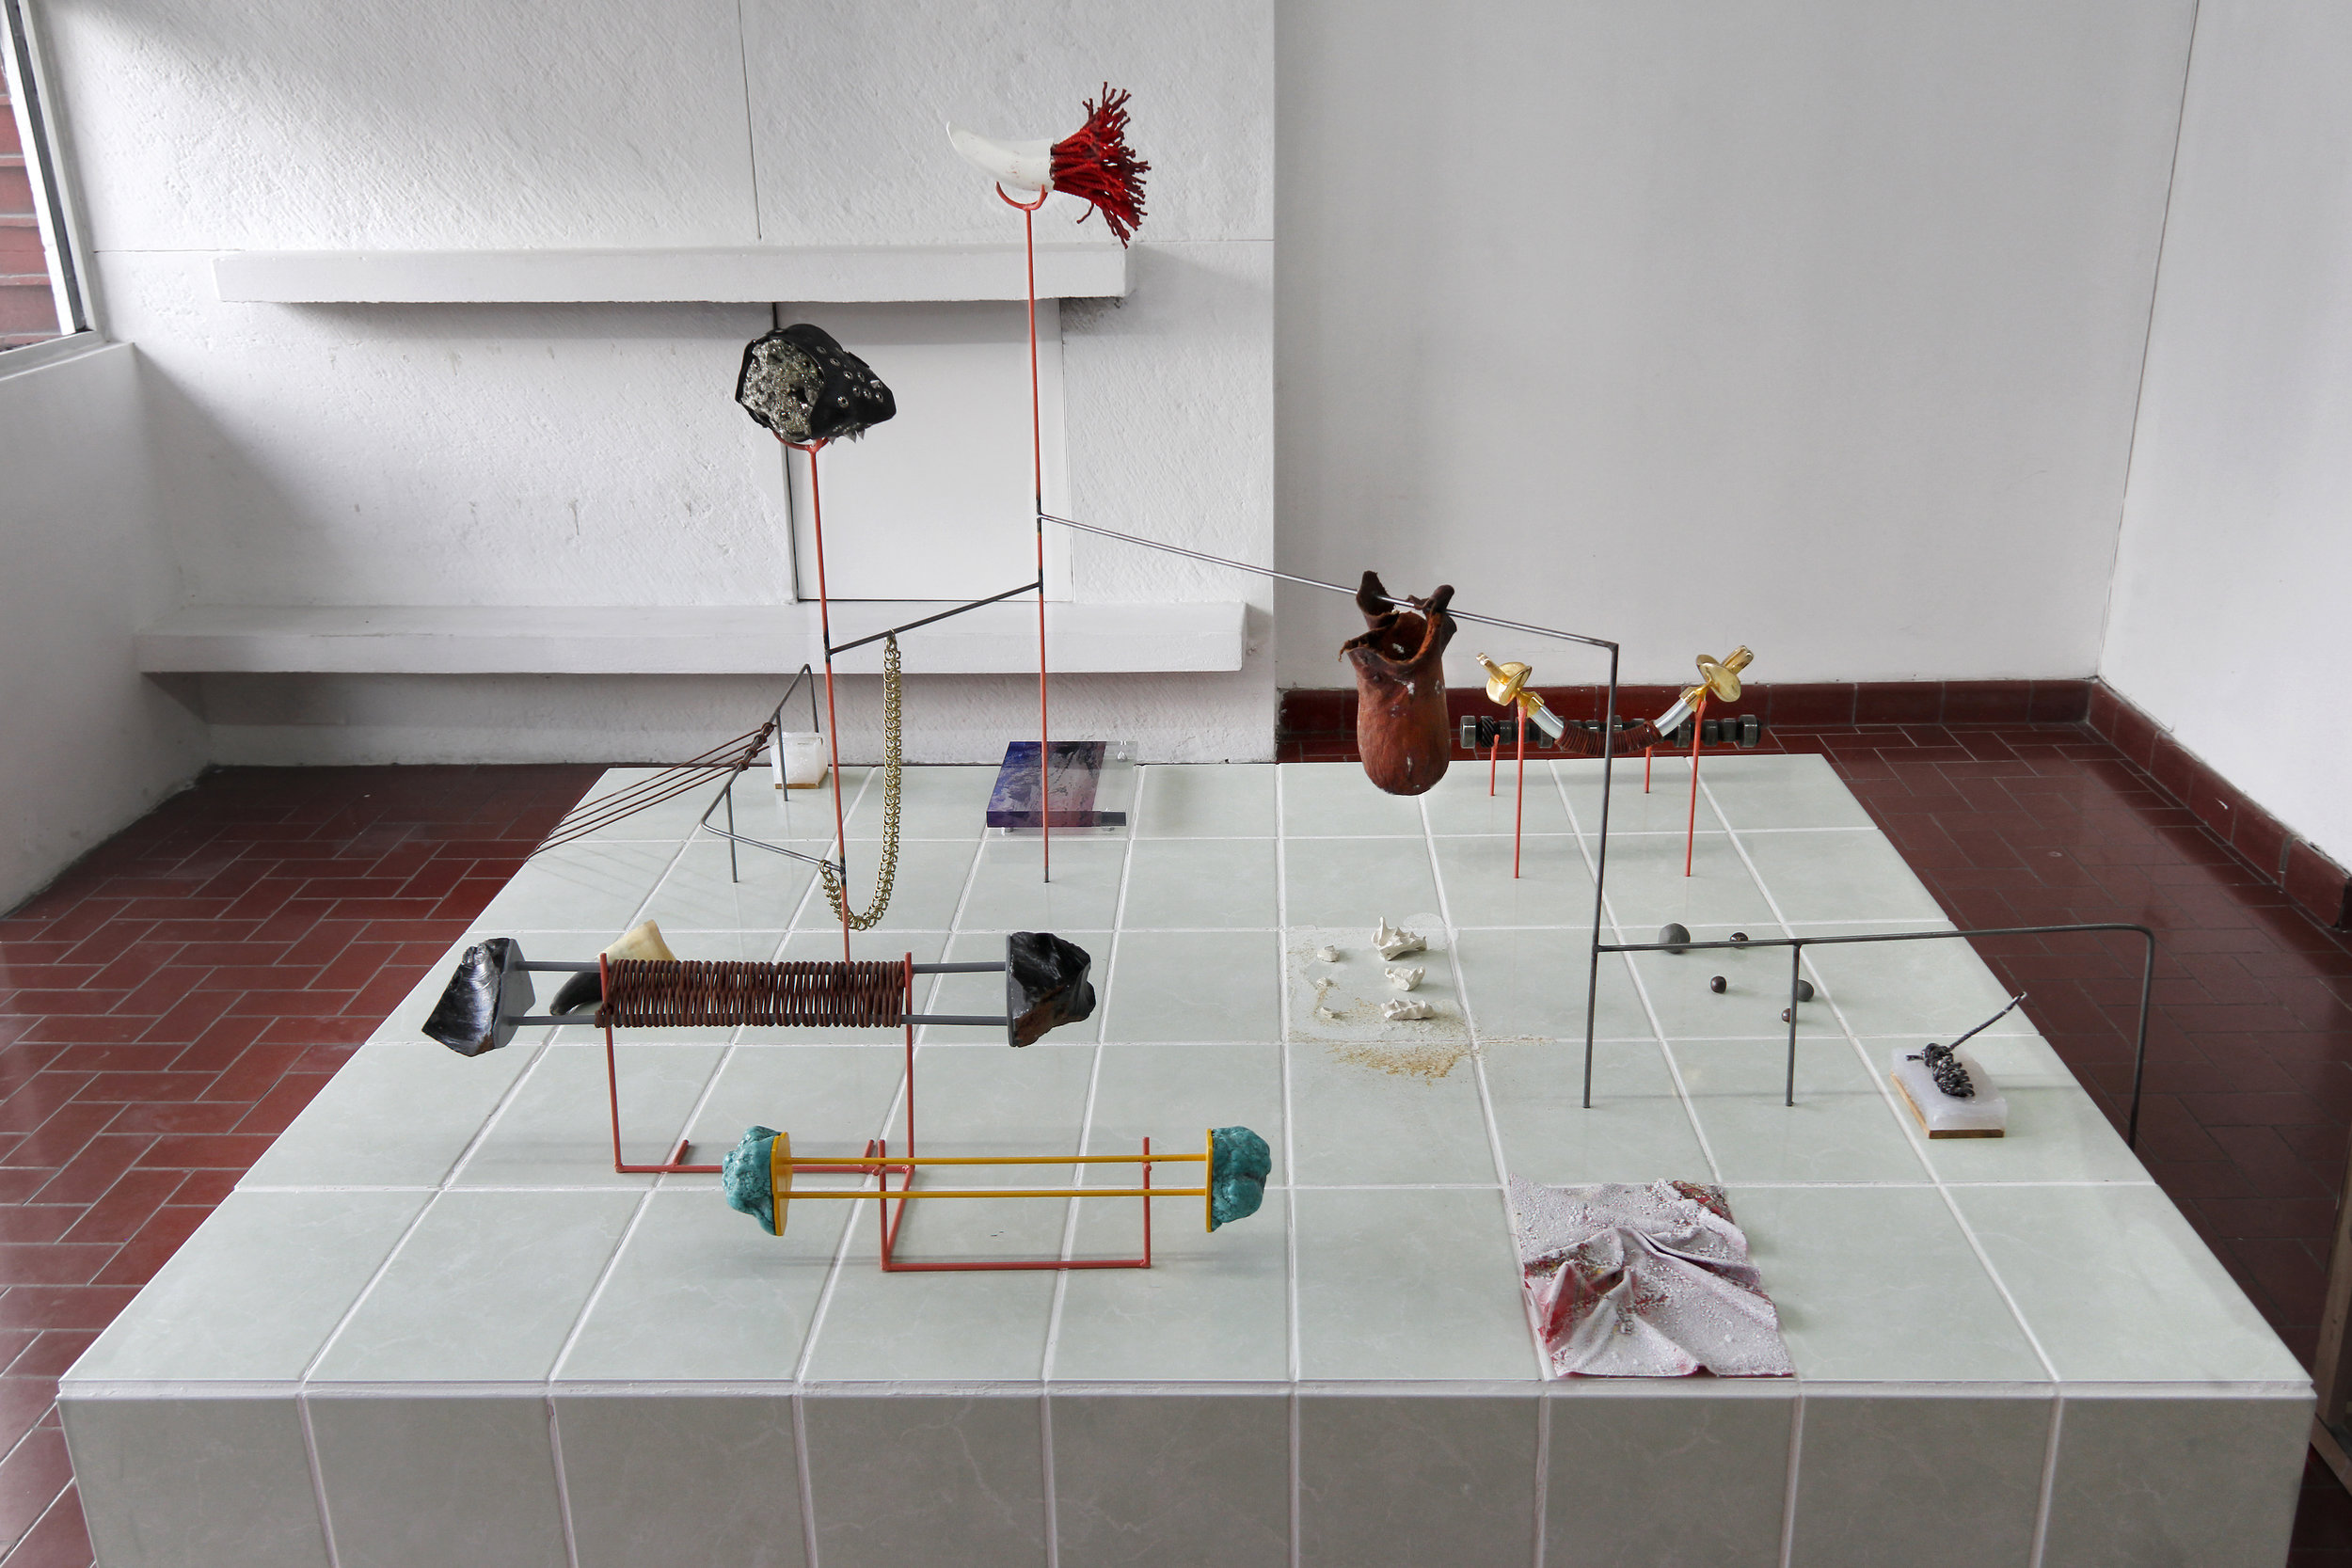 cowboy, installation view, guadalajara 90210